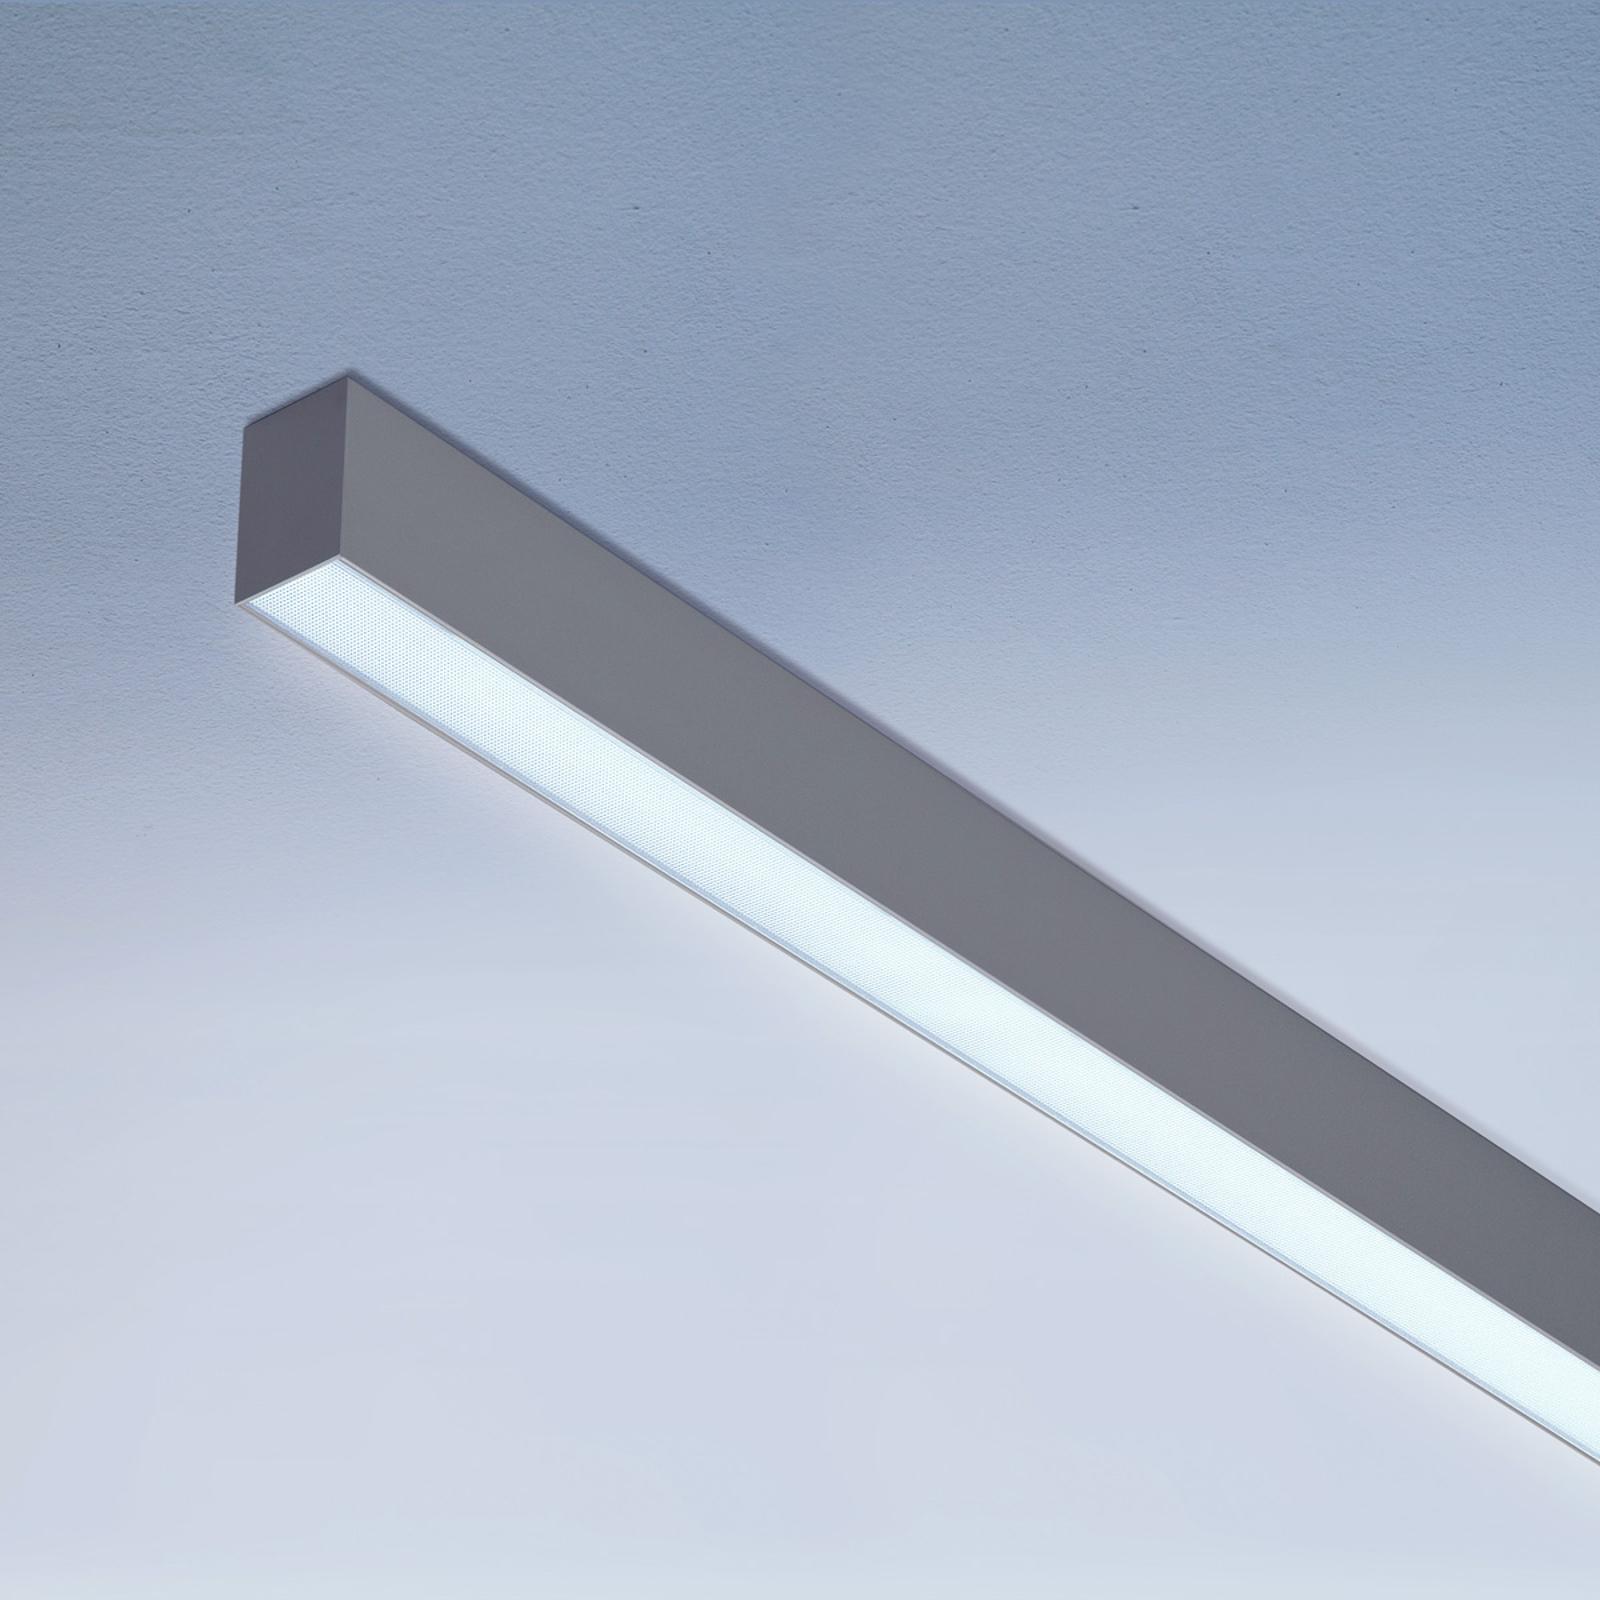 Keskiteho - LED-seinävalaisin Matric-A3 235 cm